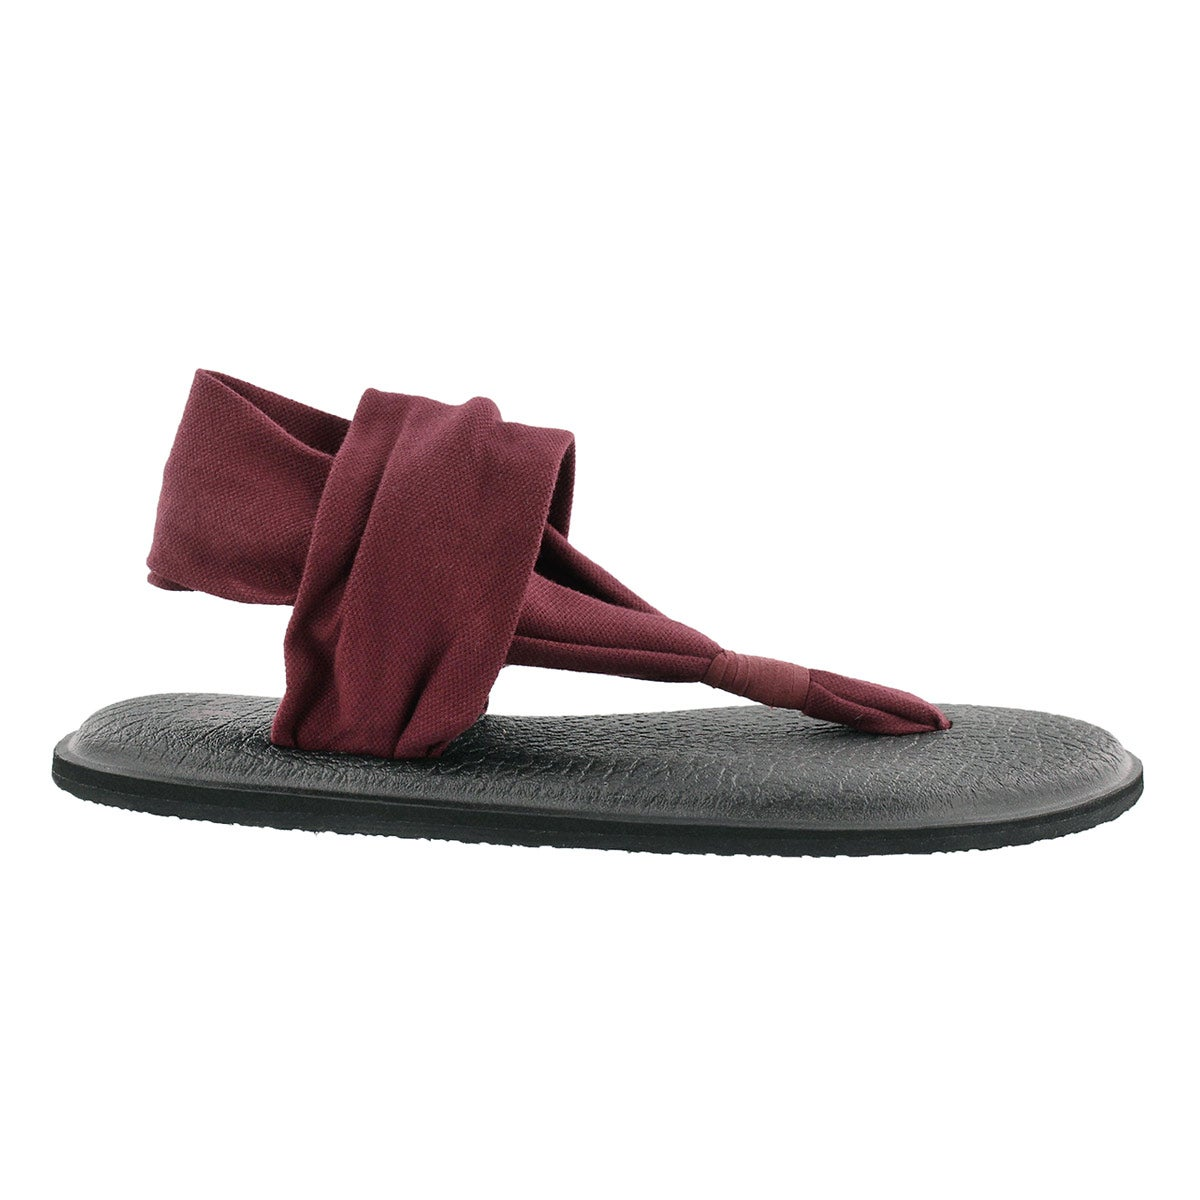 Lds Yoga Sling burgundy thong sandal